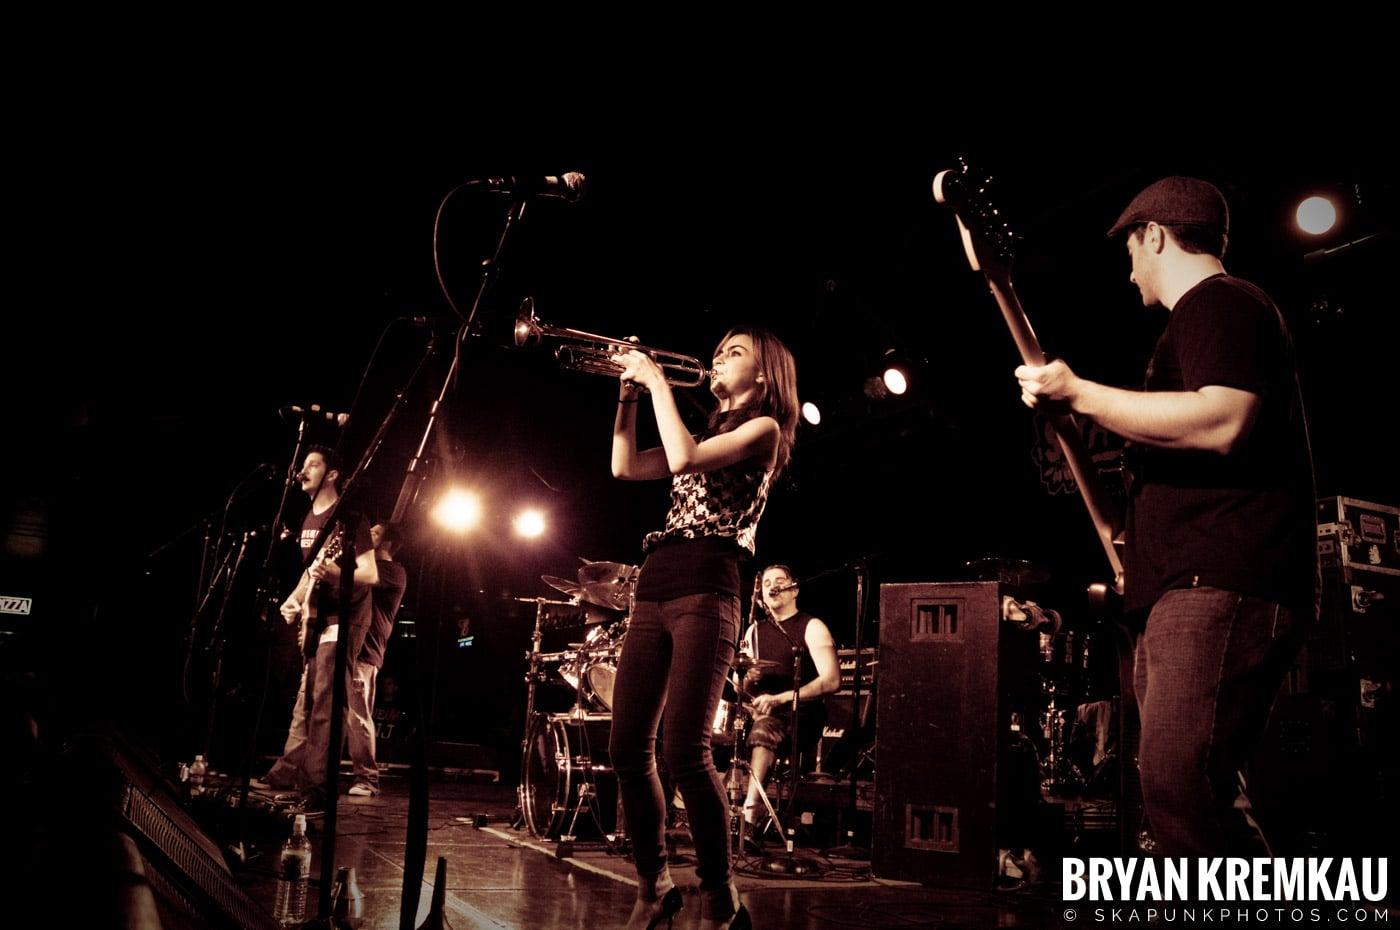 Avon Junkies (Ska is Dead Tour) @ Starland Ballroom, Sayreville, NJ - 11.15.09 (5)